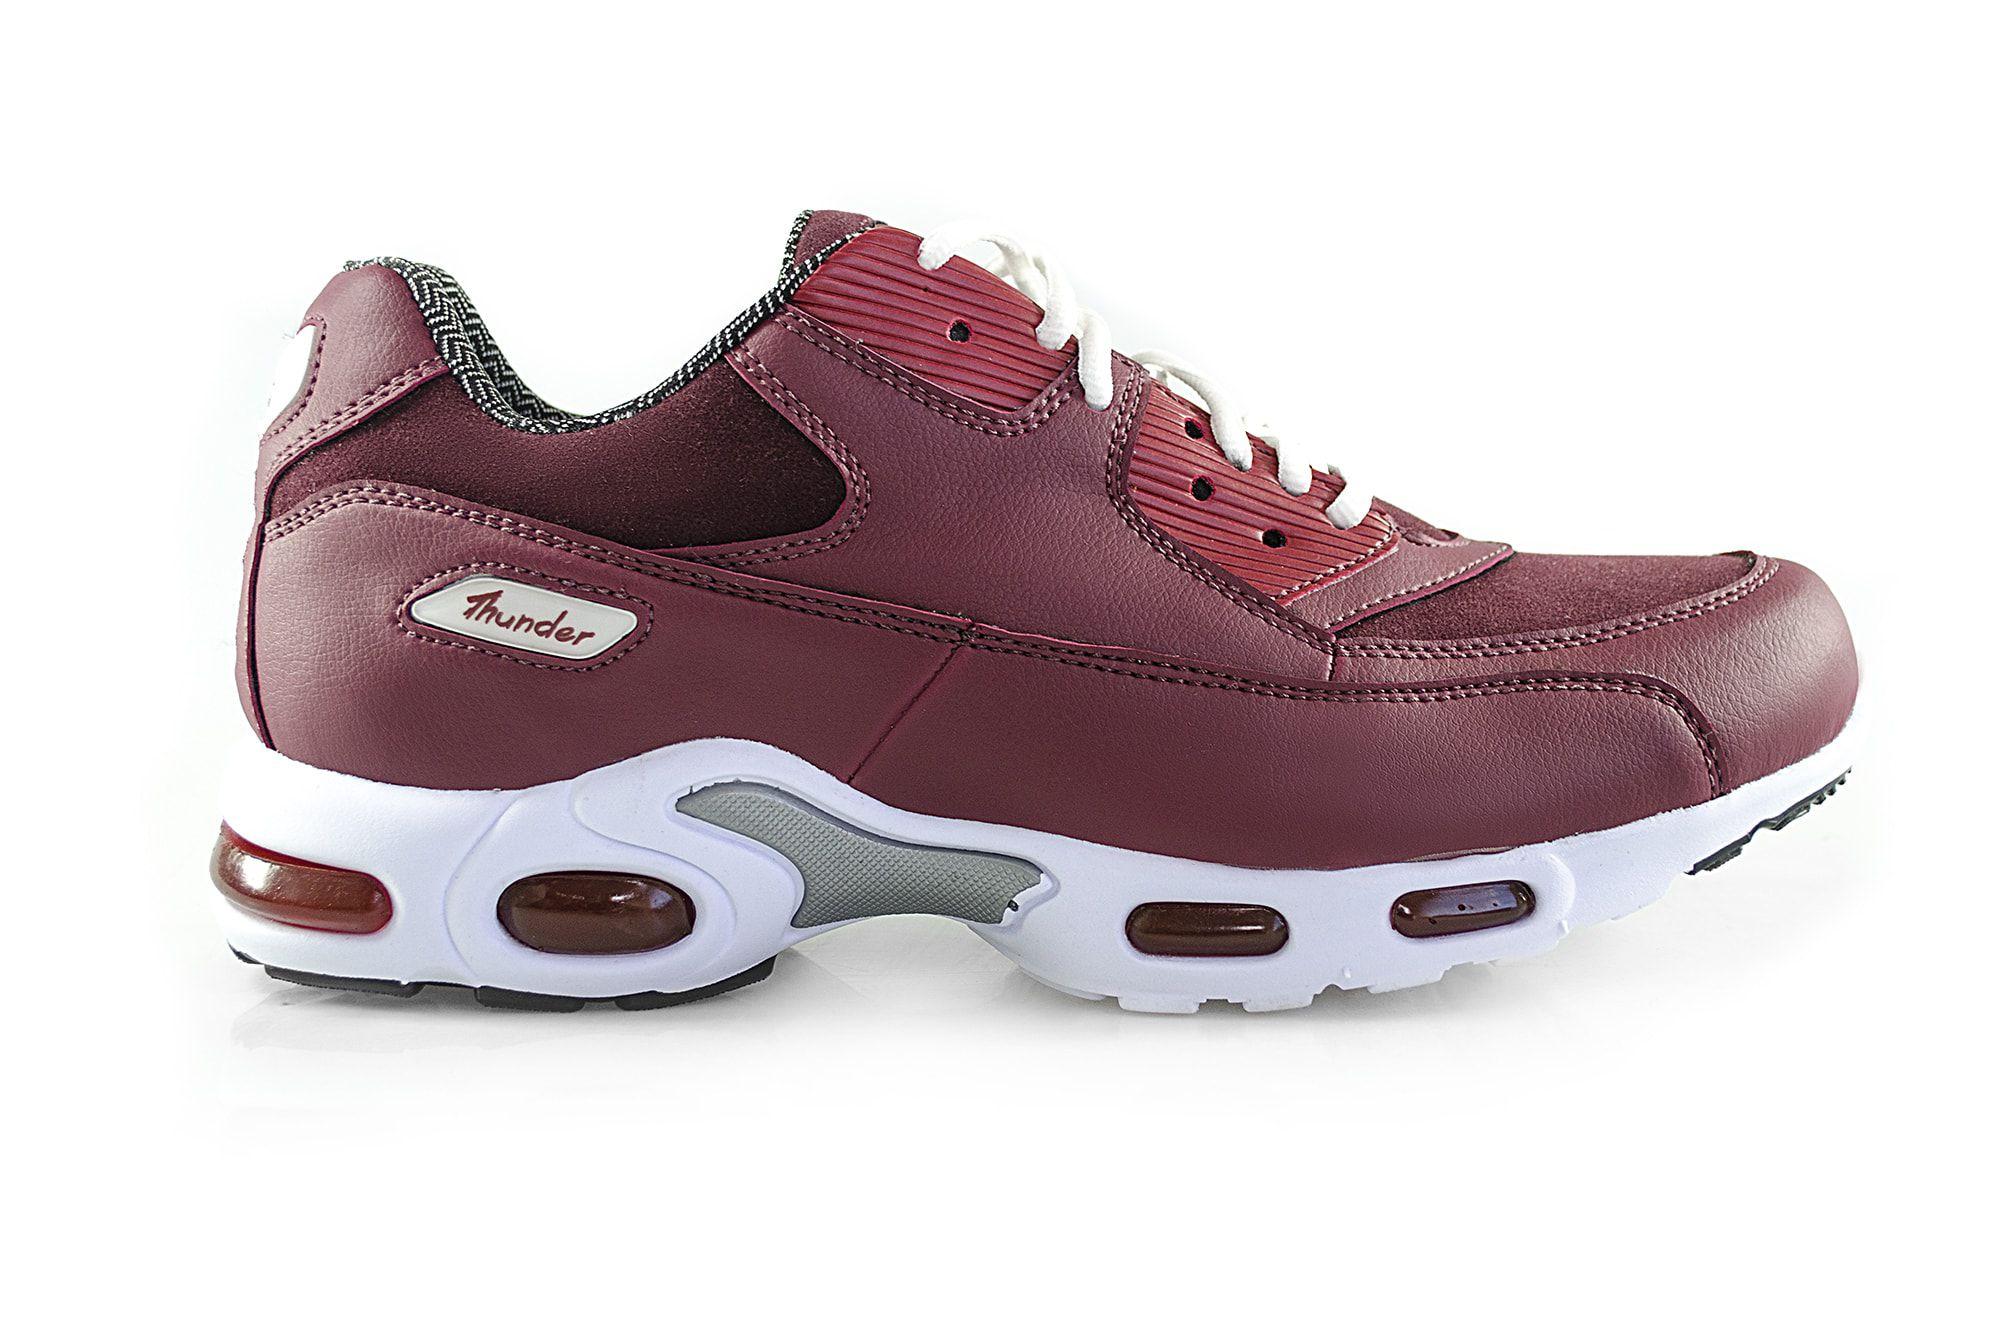 Tênis Vegano Shoes Air Damper Thunder Marsala